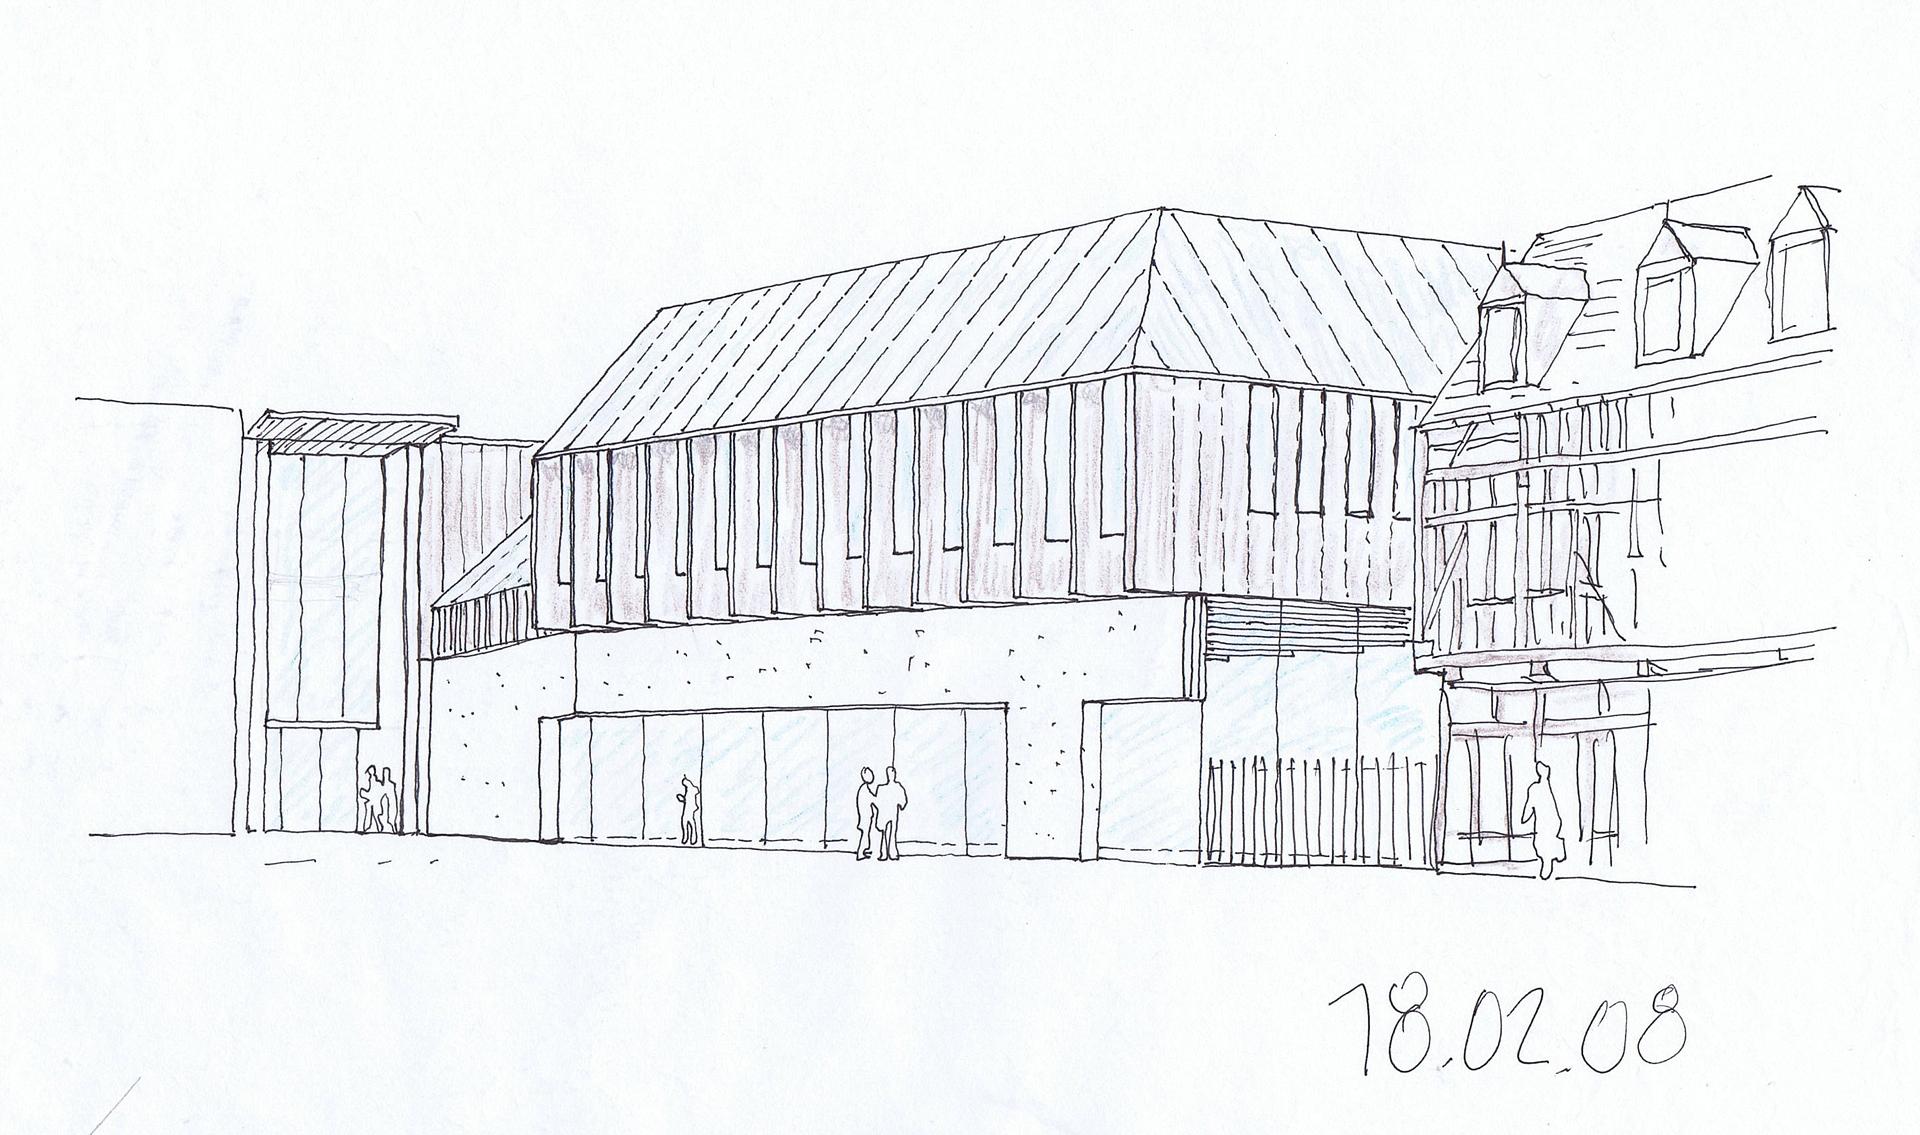 Linazasoro Sanchez: Centro amministrativo e dei congressi Troyes